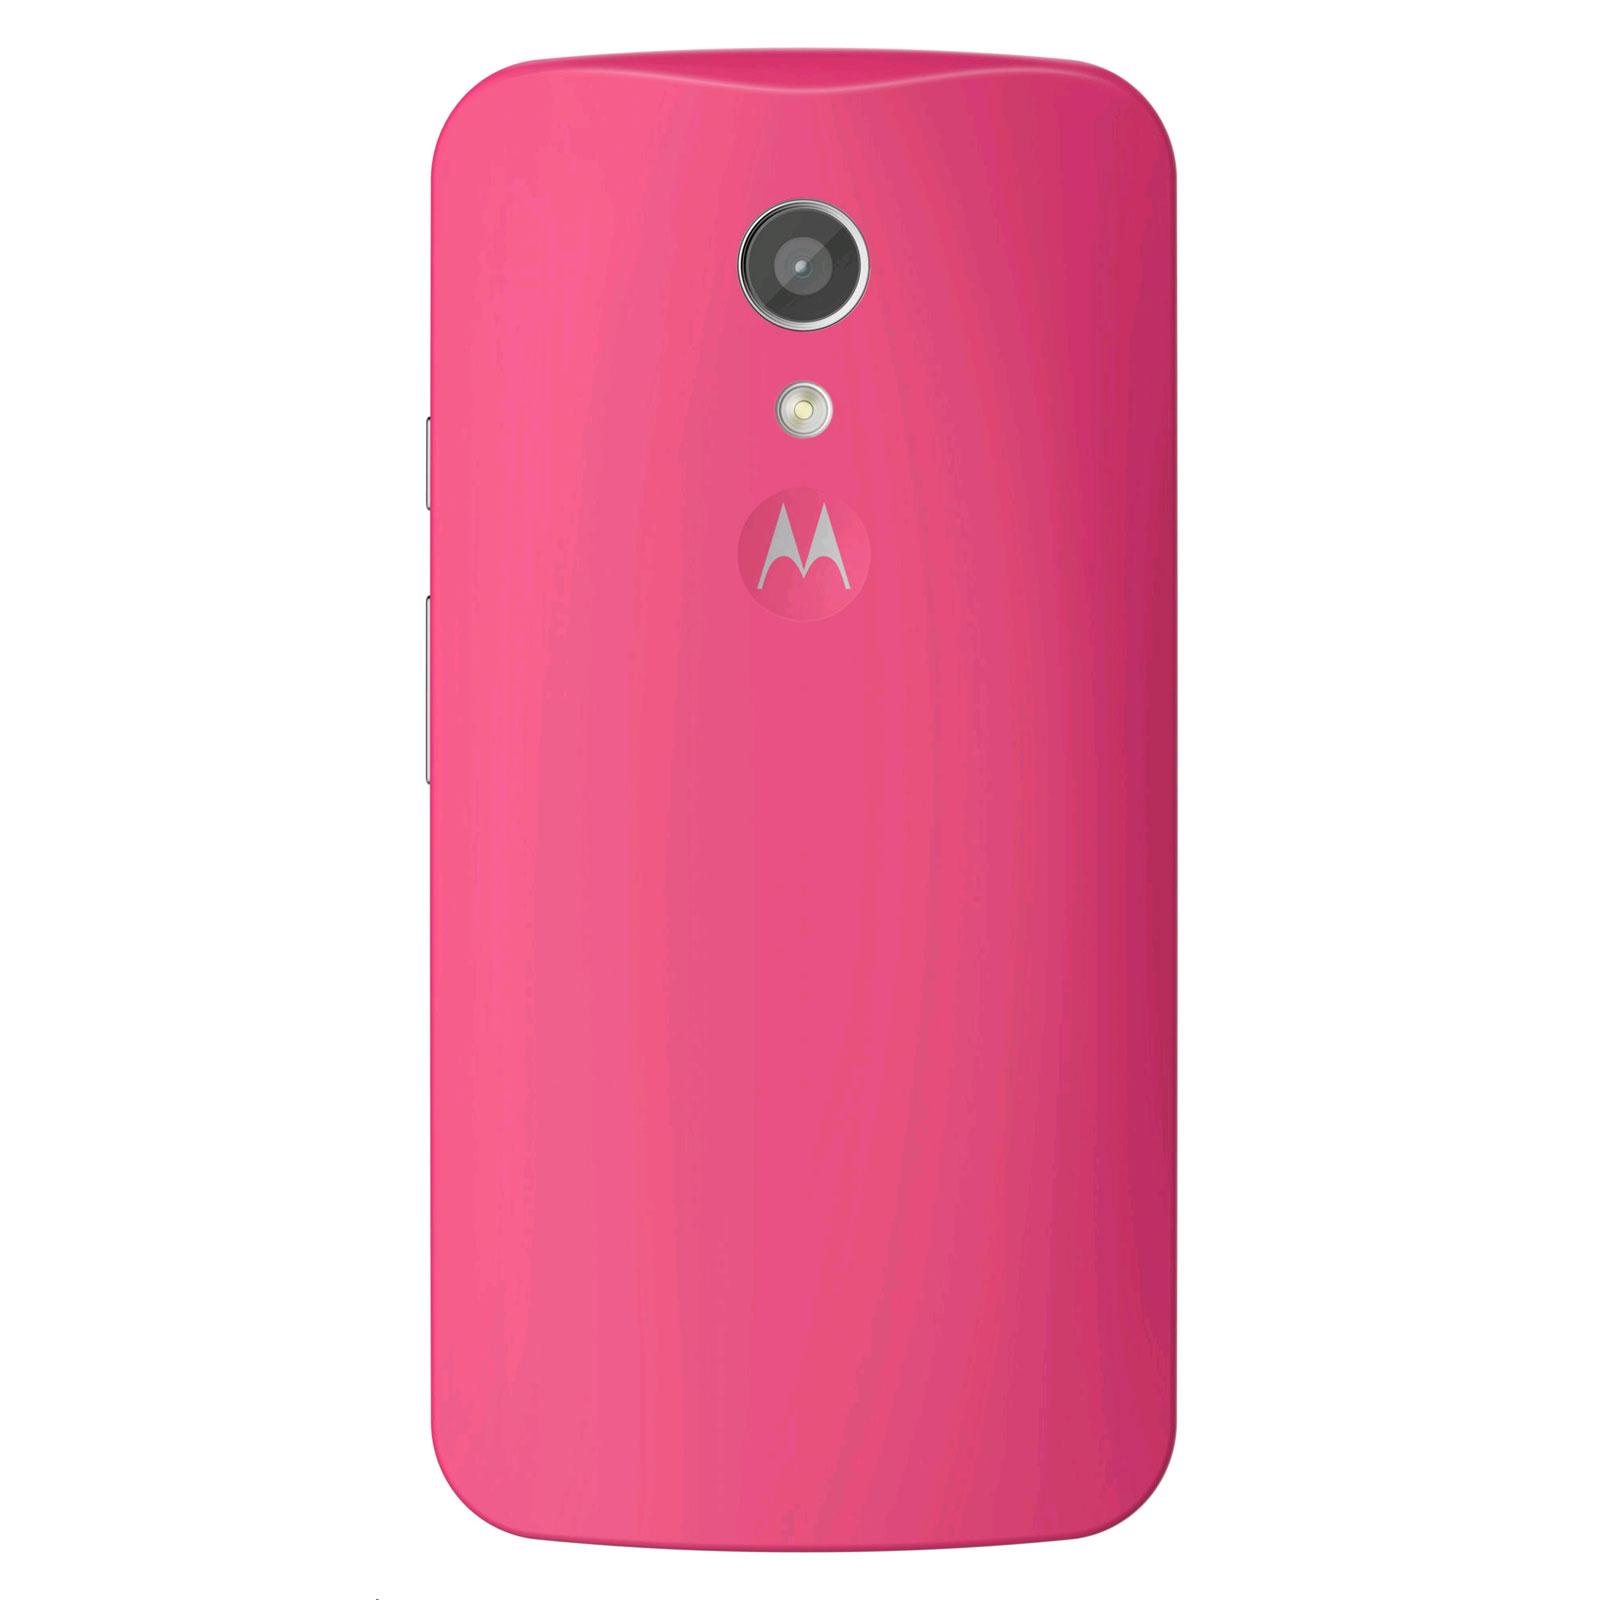 Bien connu Motorola Coque d'origine Framboise Motorola Moto G 2ème Génération  RA35